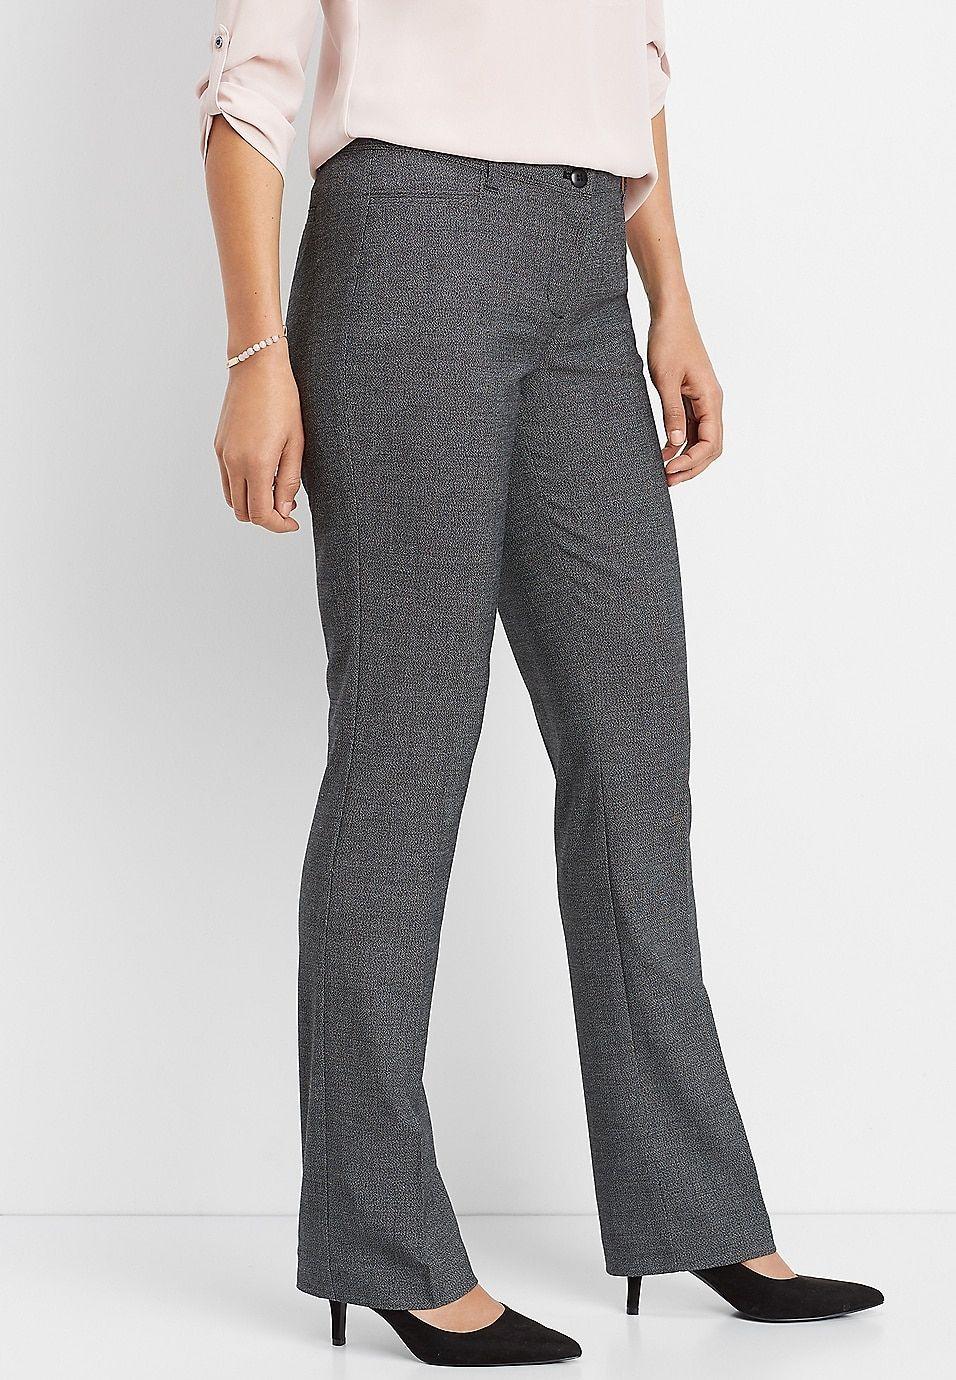 9af9f4fd2bd Clothing | Products | Pants, Workout pants, Yoga pants